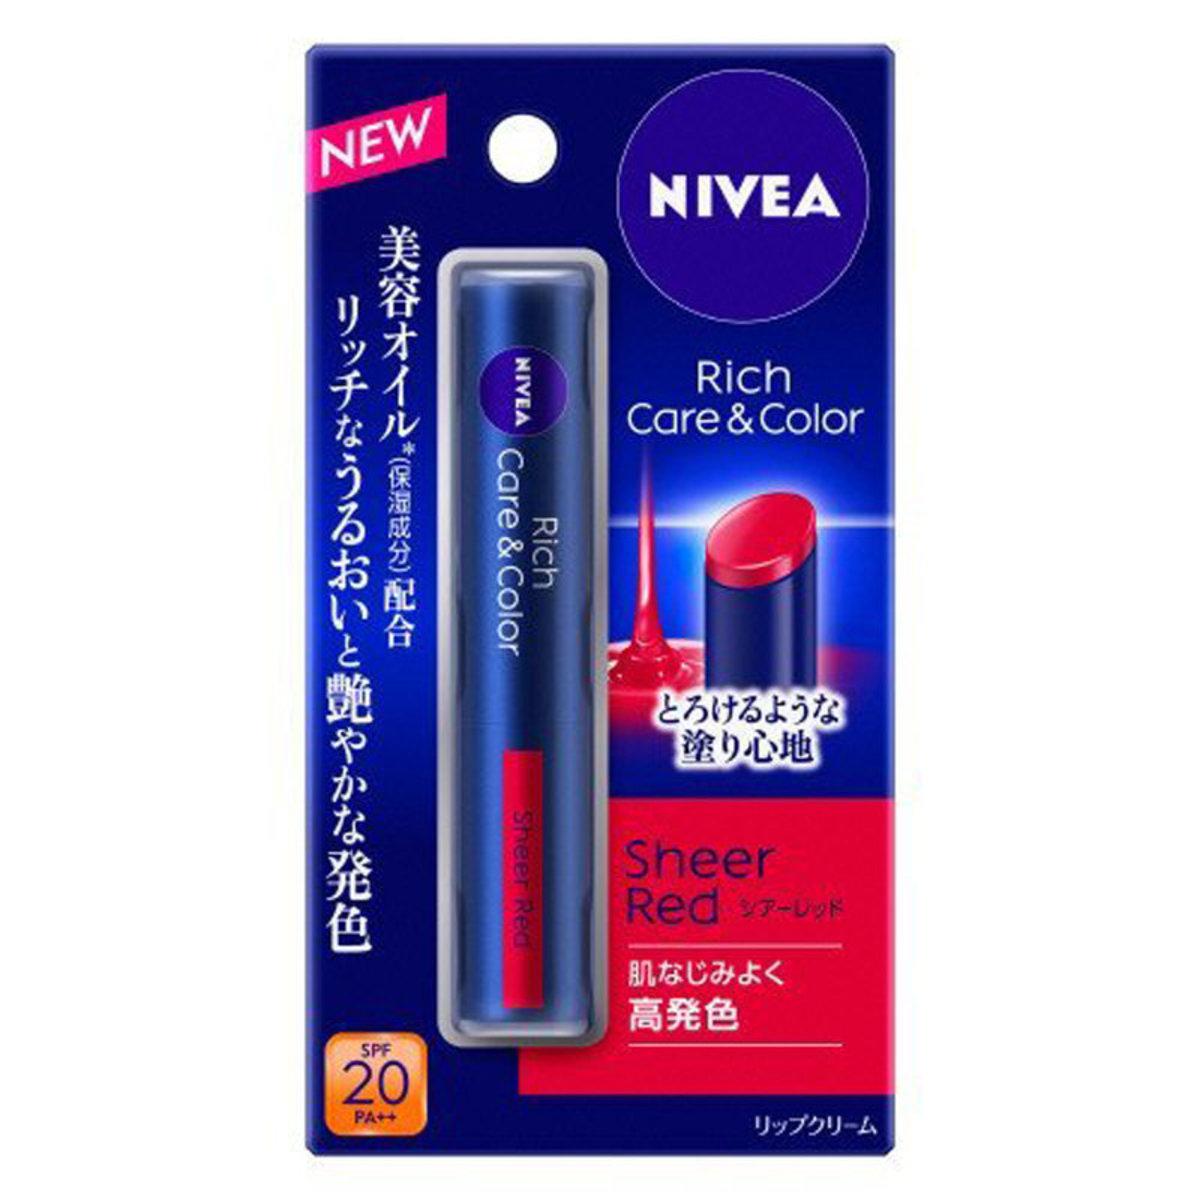 NIVEA Rich Care & Color Lip  妮維雅  豐盈水潤顯色潤唇膏(Col# SHEER RED)  紅色